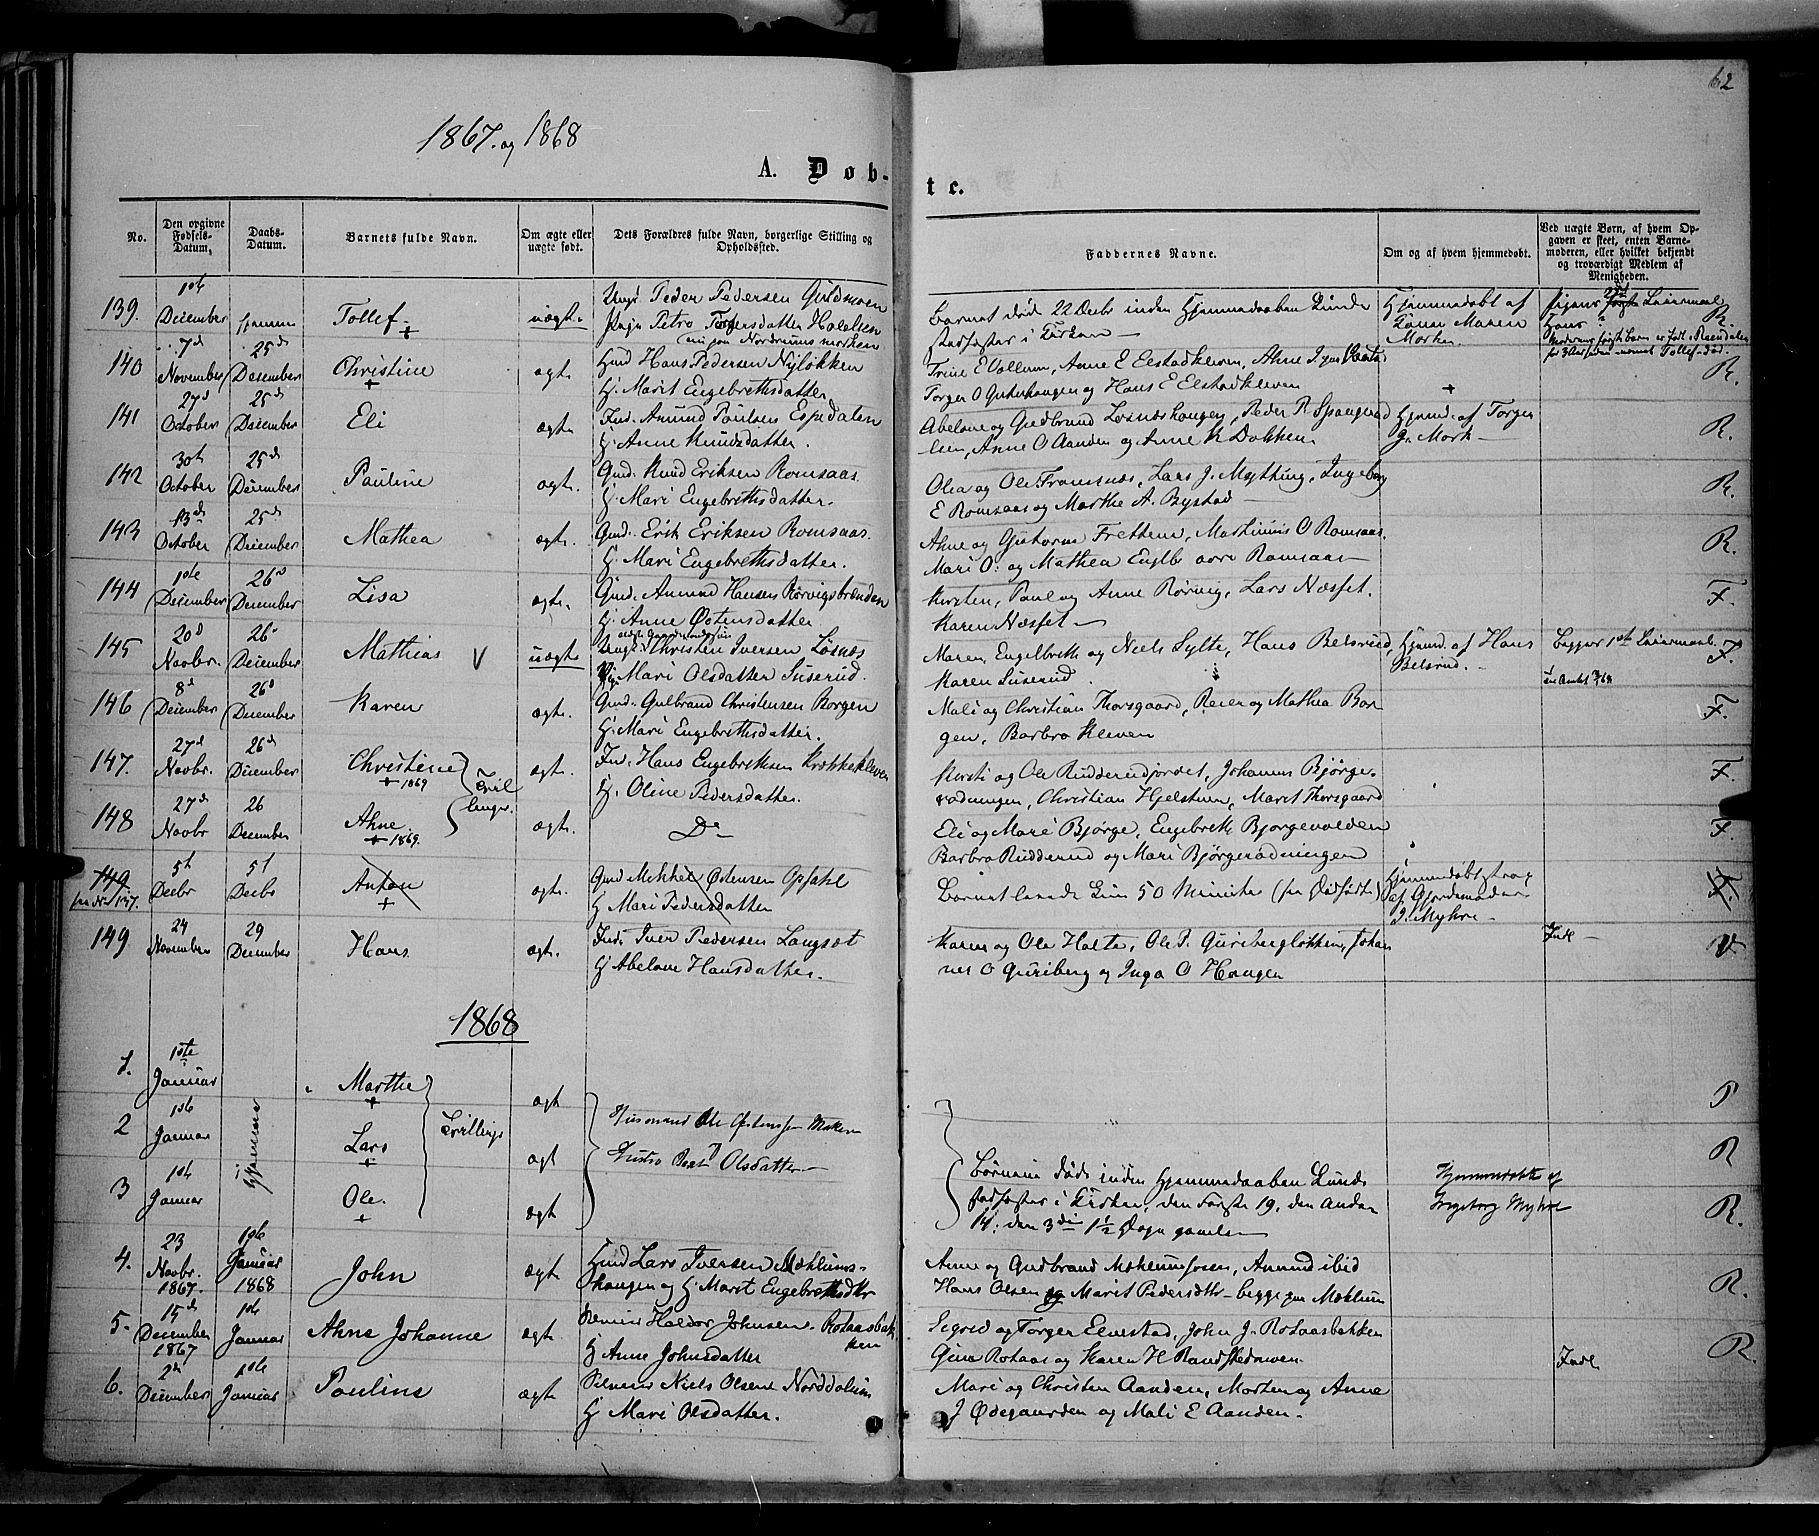 SAH, Ringebu prestekontor, Ministerialbok nr. 7, 1860-1877, s. 62